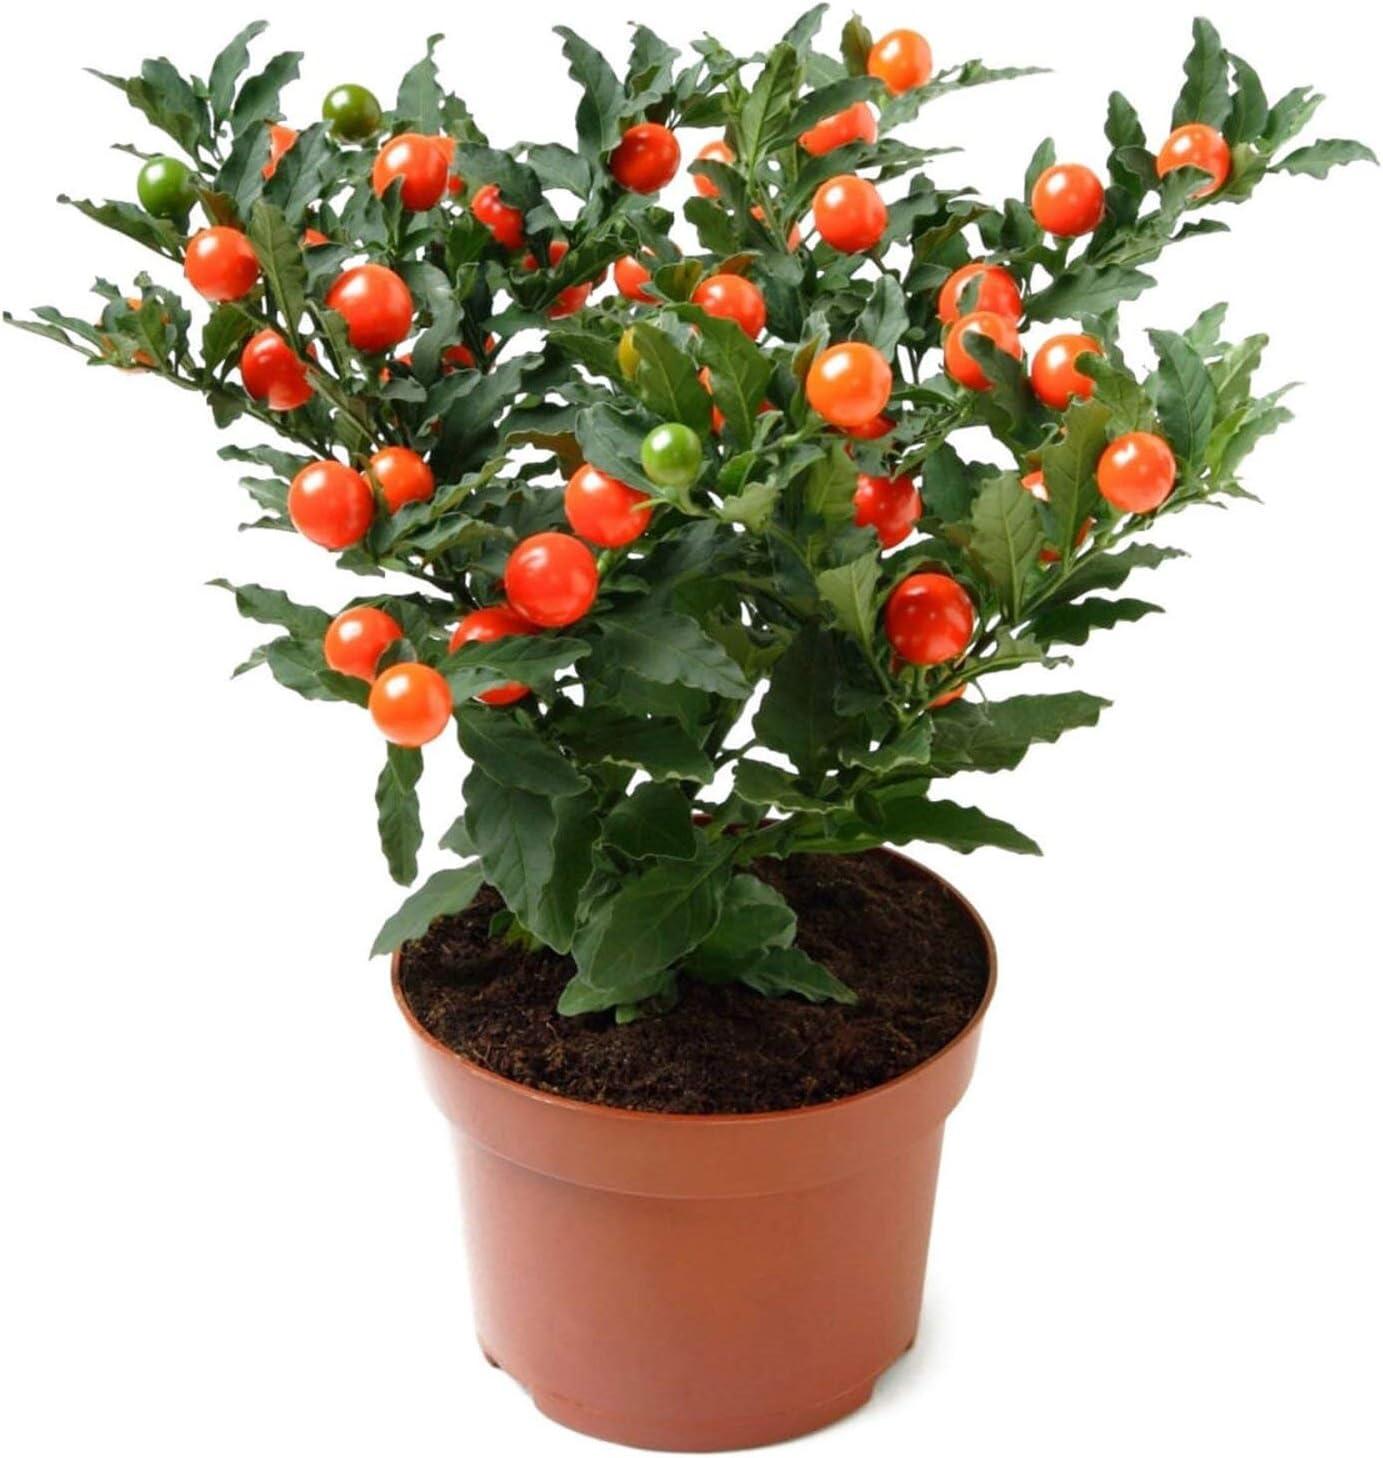 NIKA SEEDS New Shipping Free - Flowers Jerusalem Cherry Christmas favorite Perennial Plant